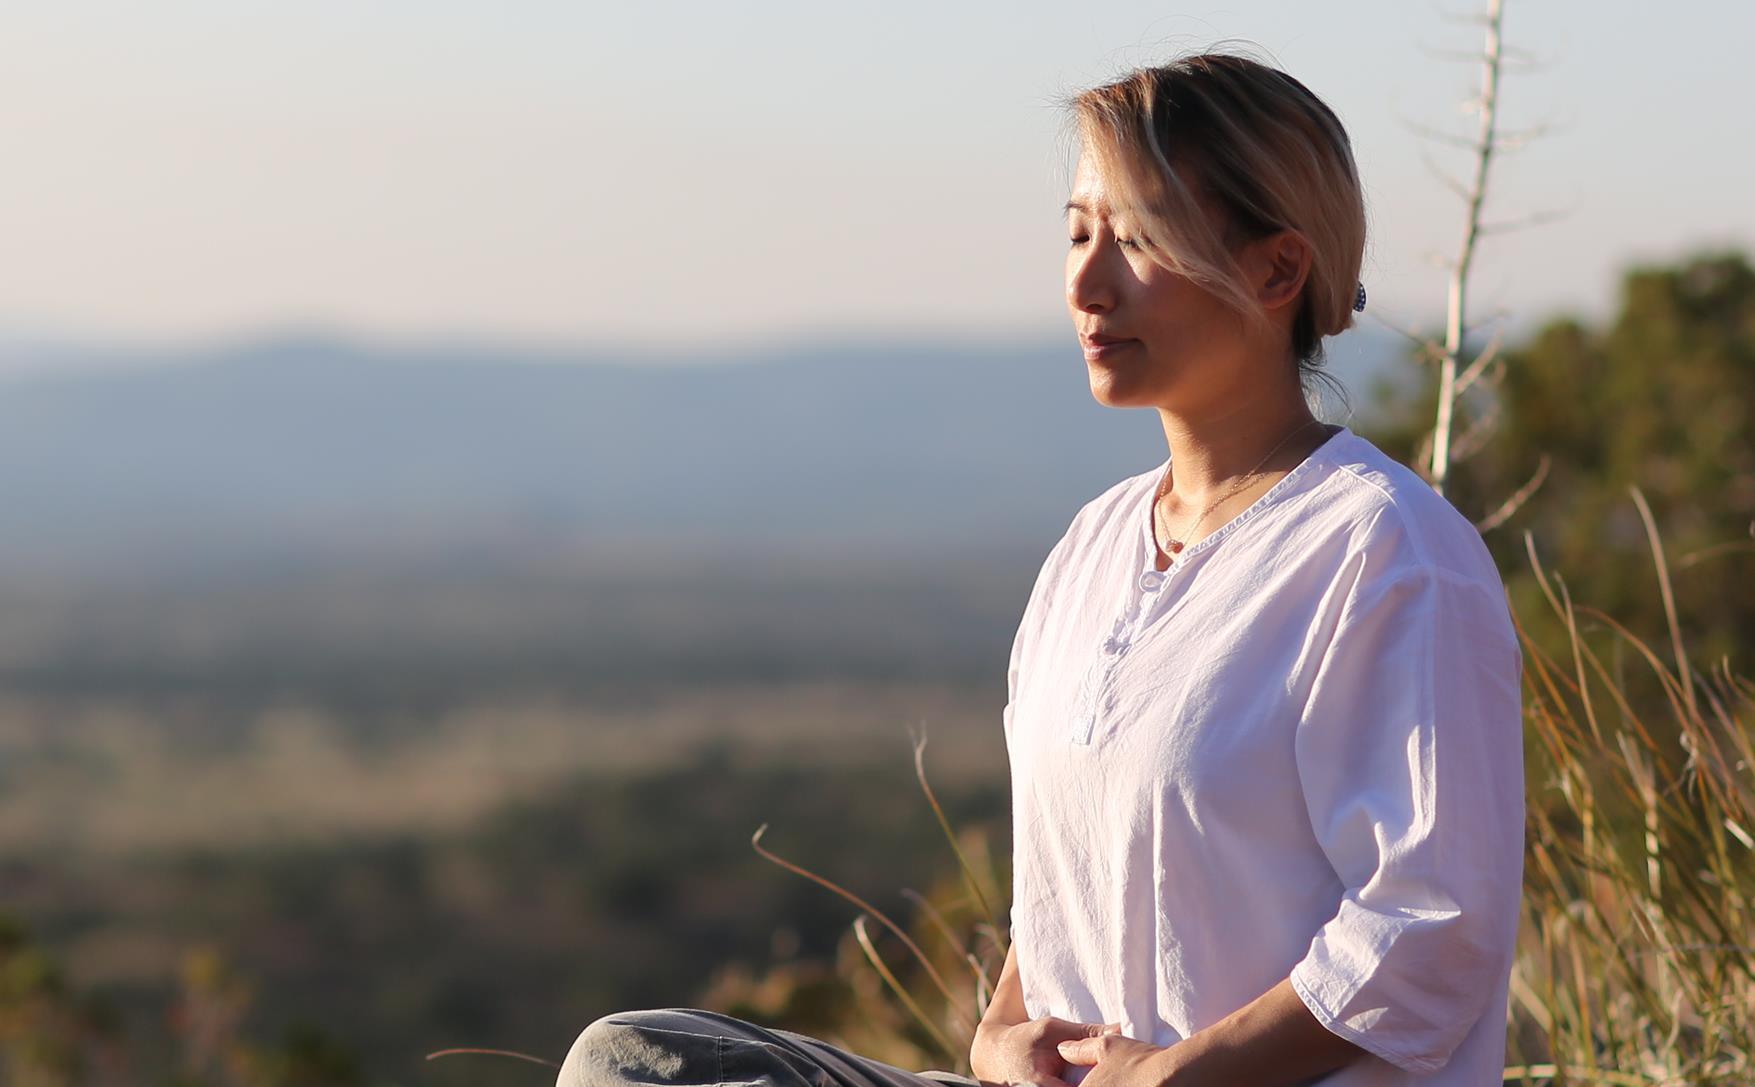 Practice Deep Meditation Nov 23rd